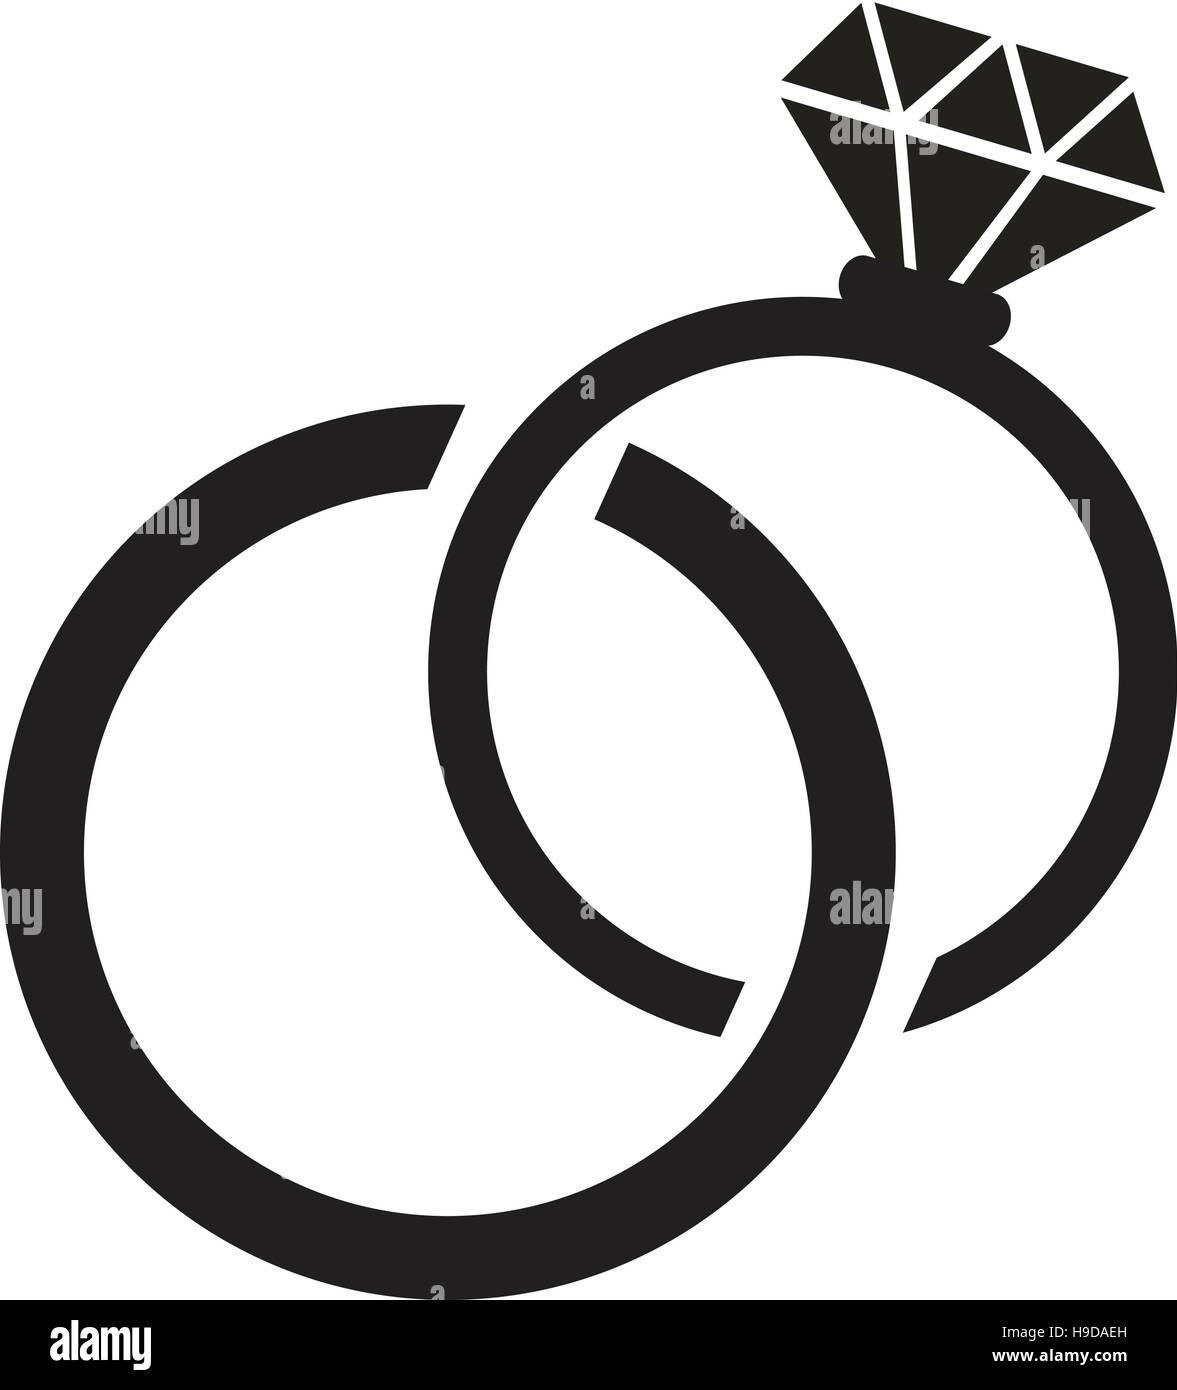 Wedding Rings Icon Stock Vector Art Illustration Vector Image